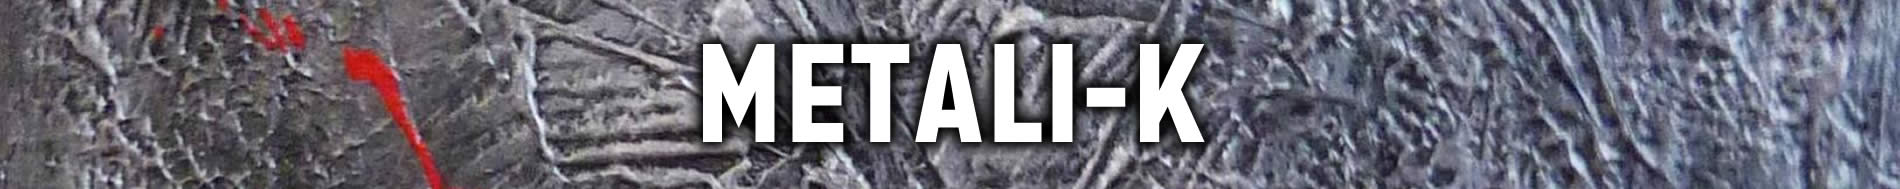 titre_metalik